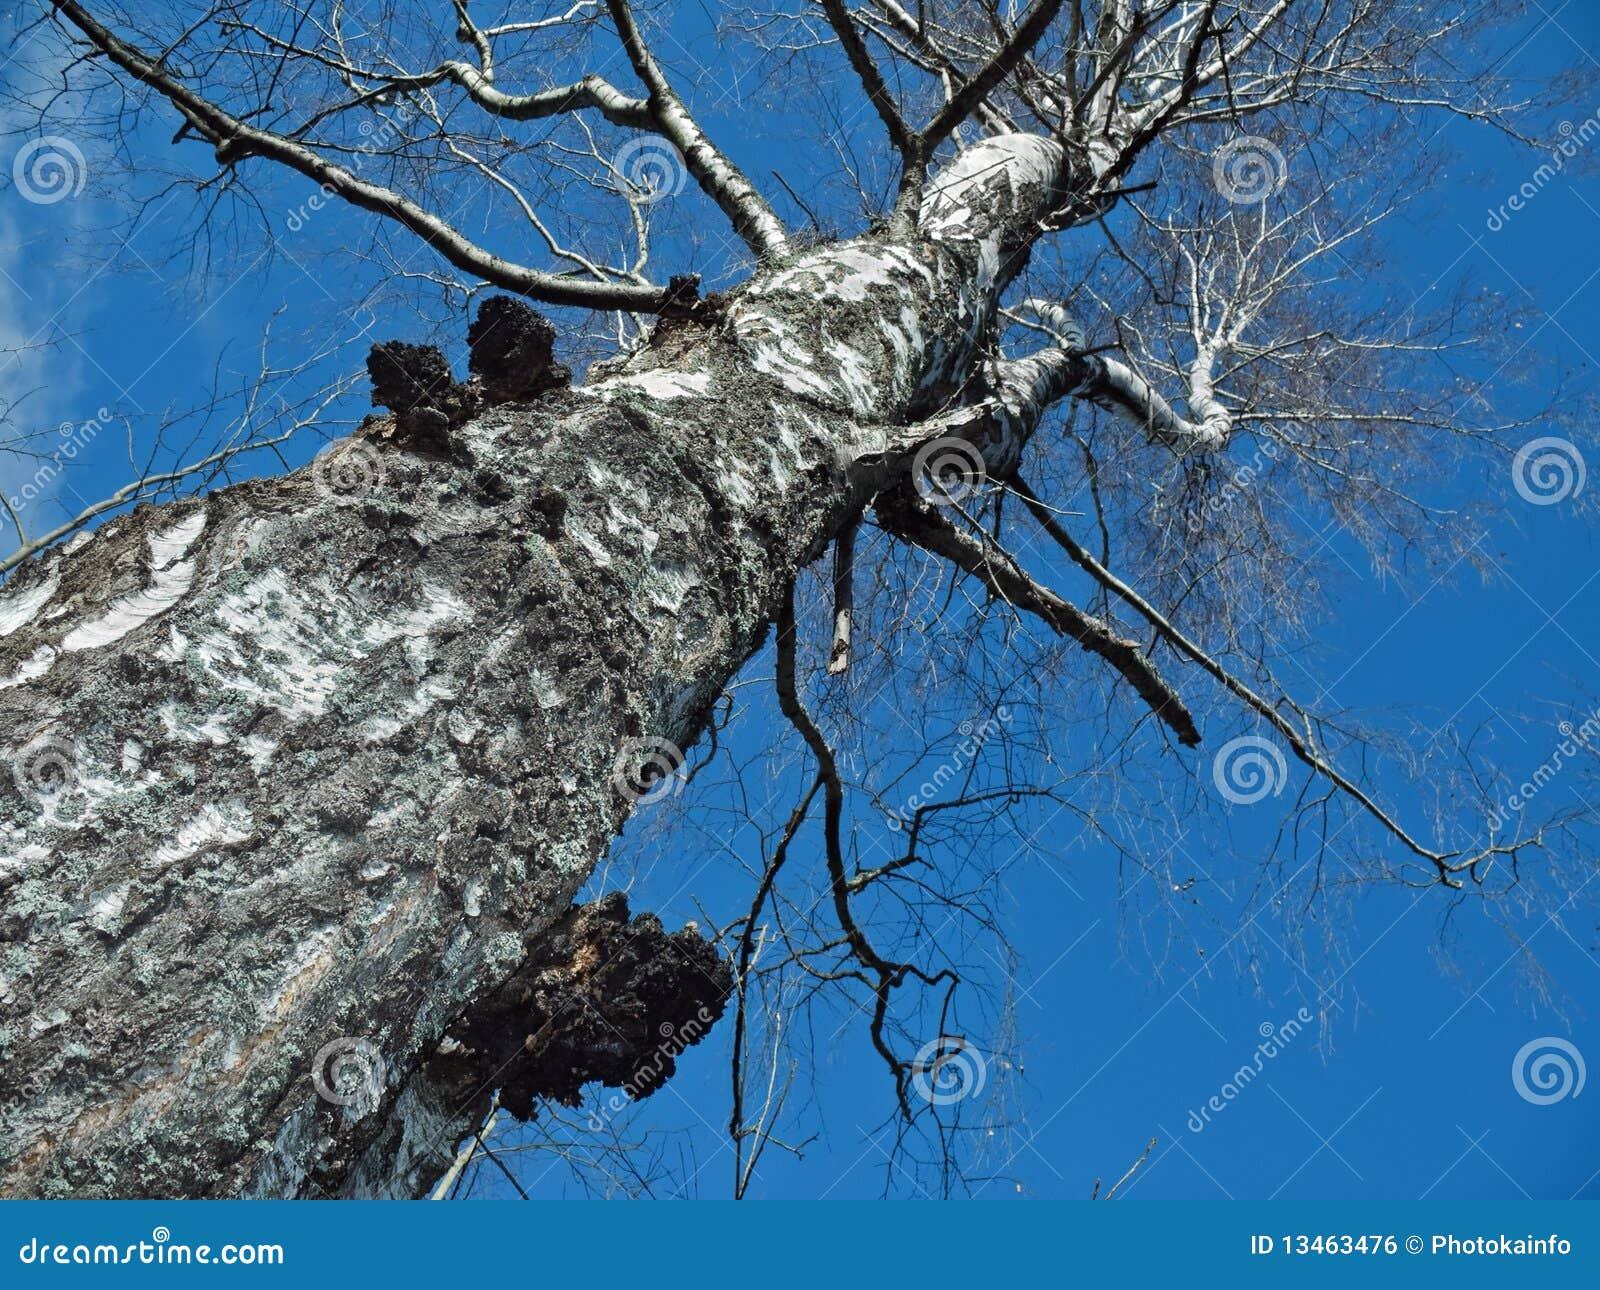 Mushroom on spring birch